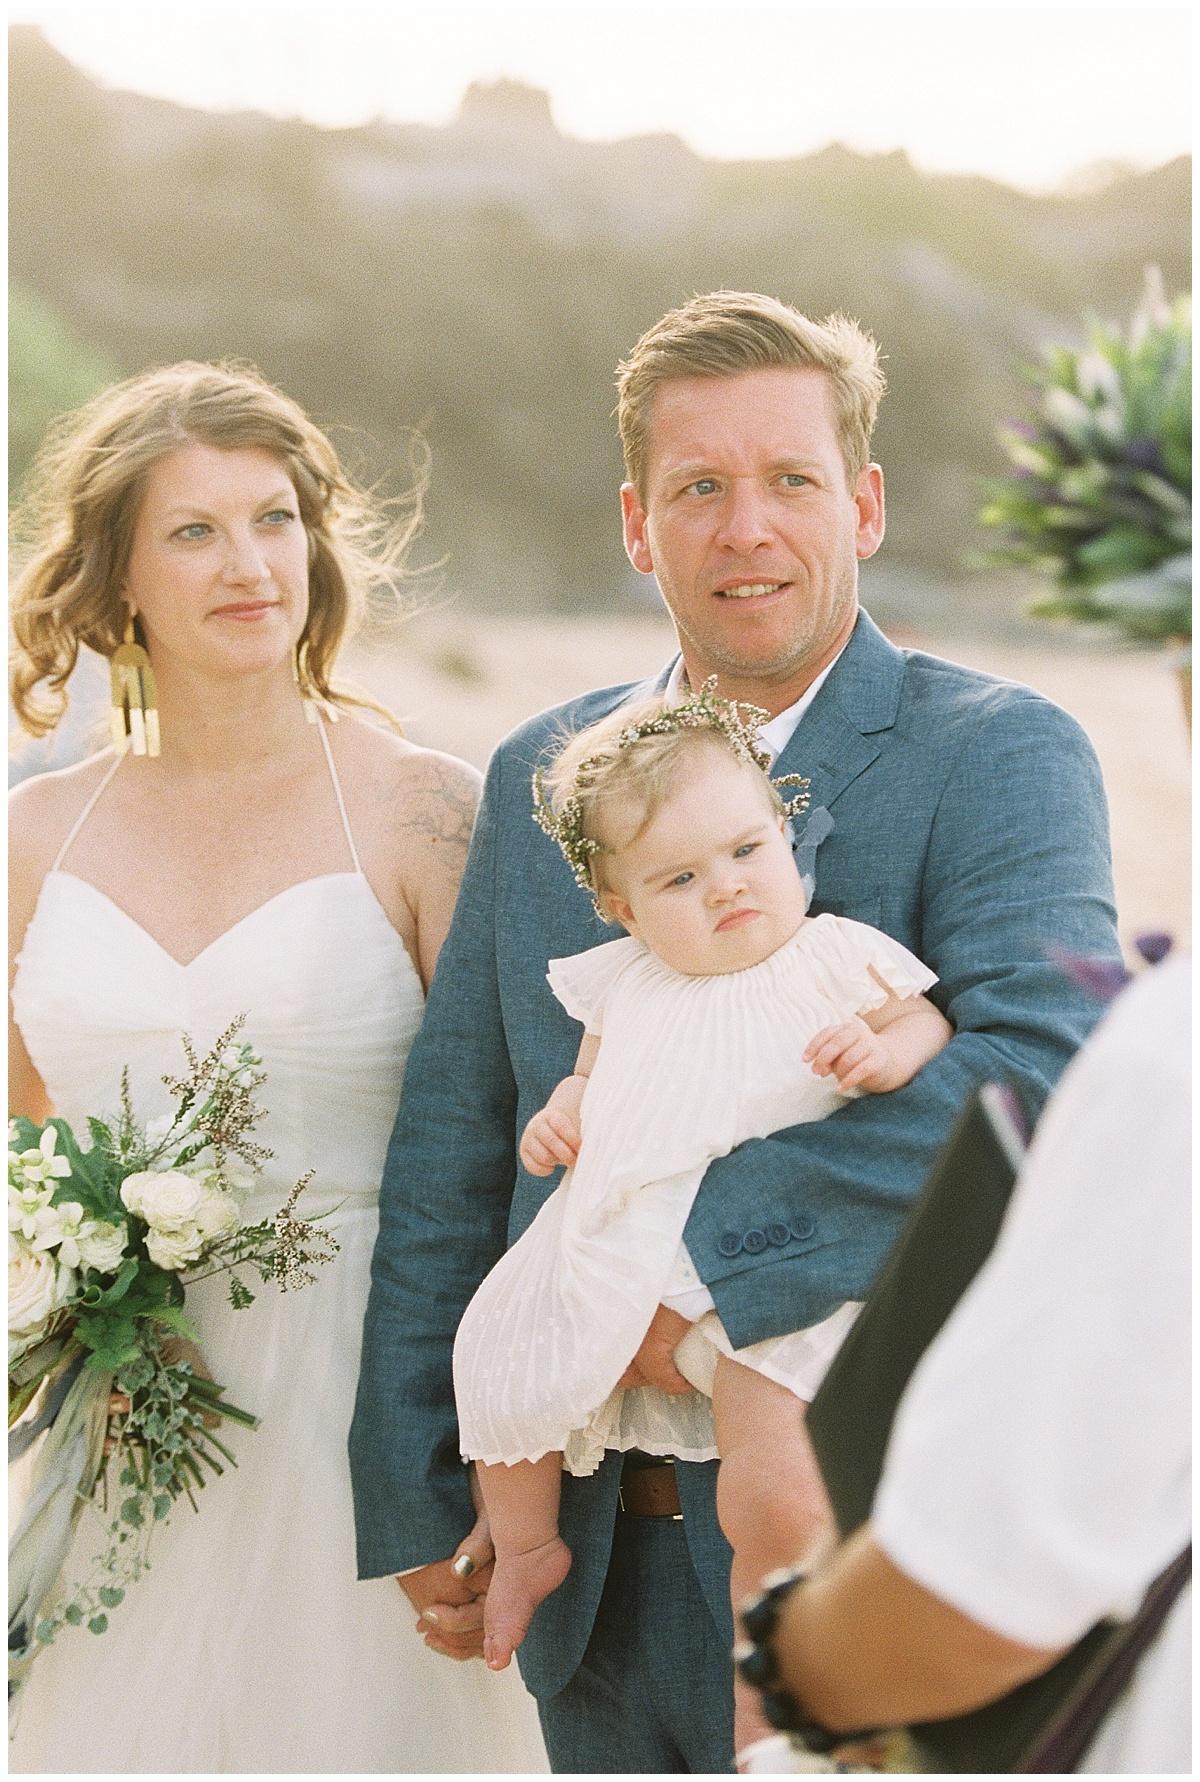 beach-elopement-bride-groom-baby-girl-looking-at-officiant.jpg